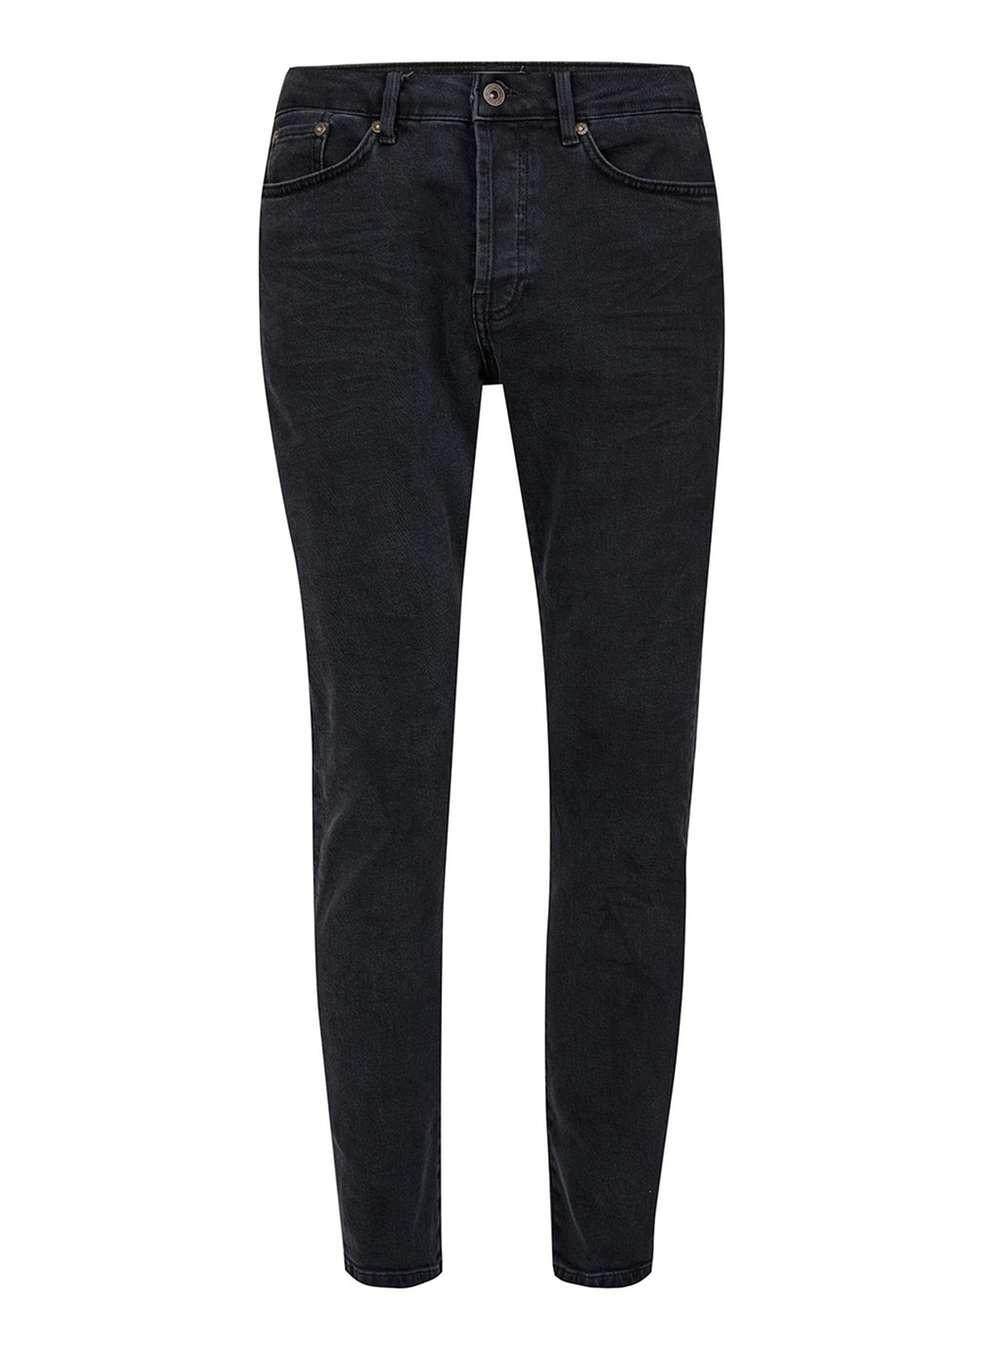 Topman Washed Black Jeans